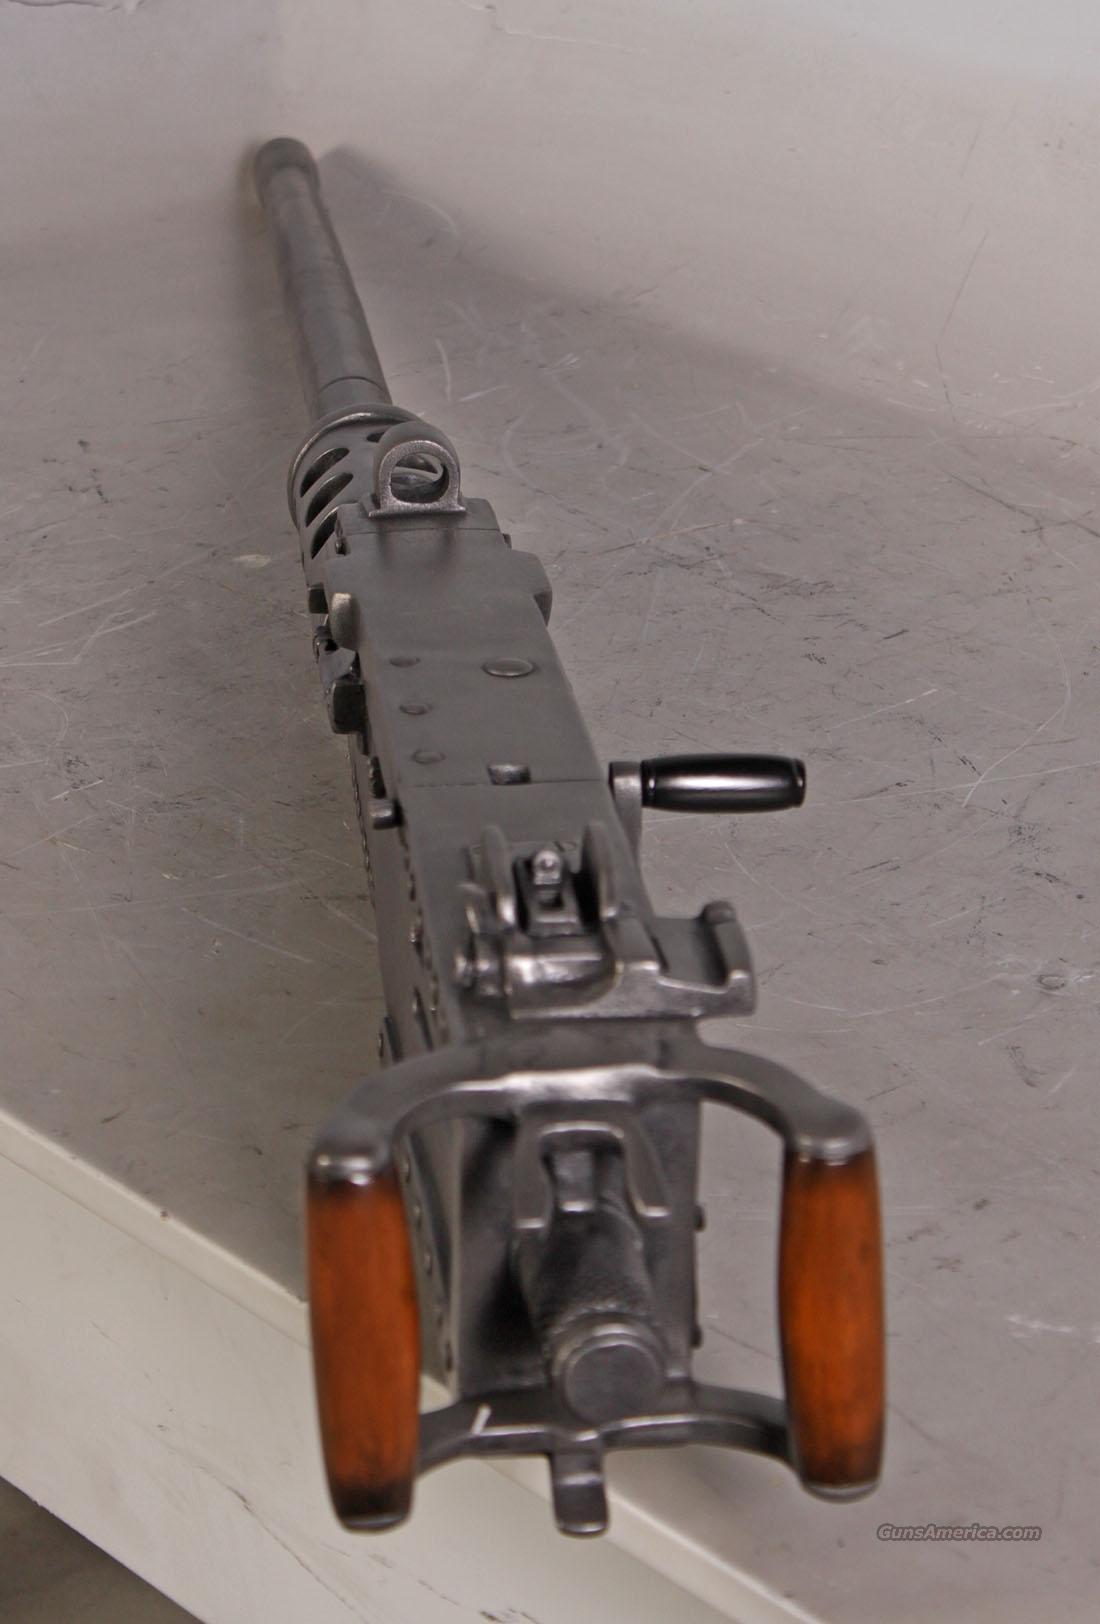 M2 Browning 50 Cal Replica Machine gun